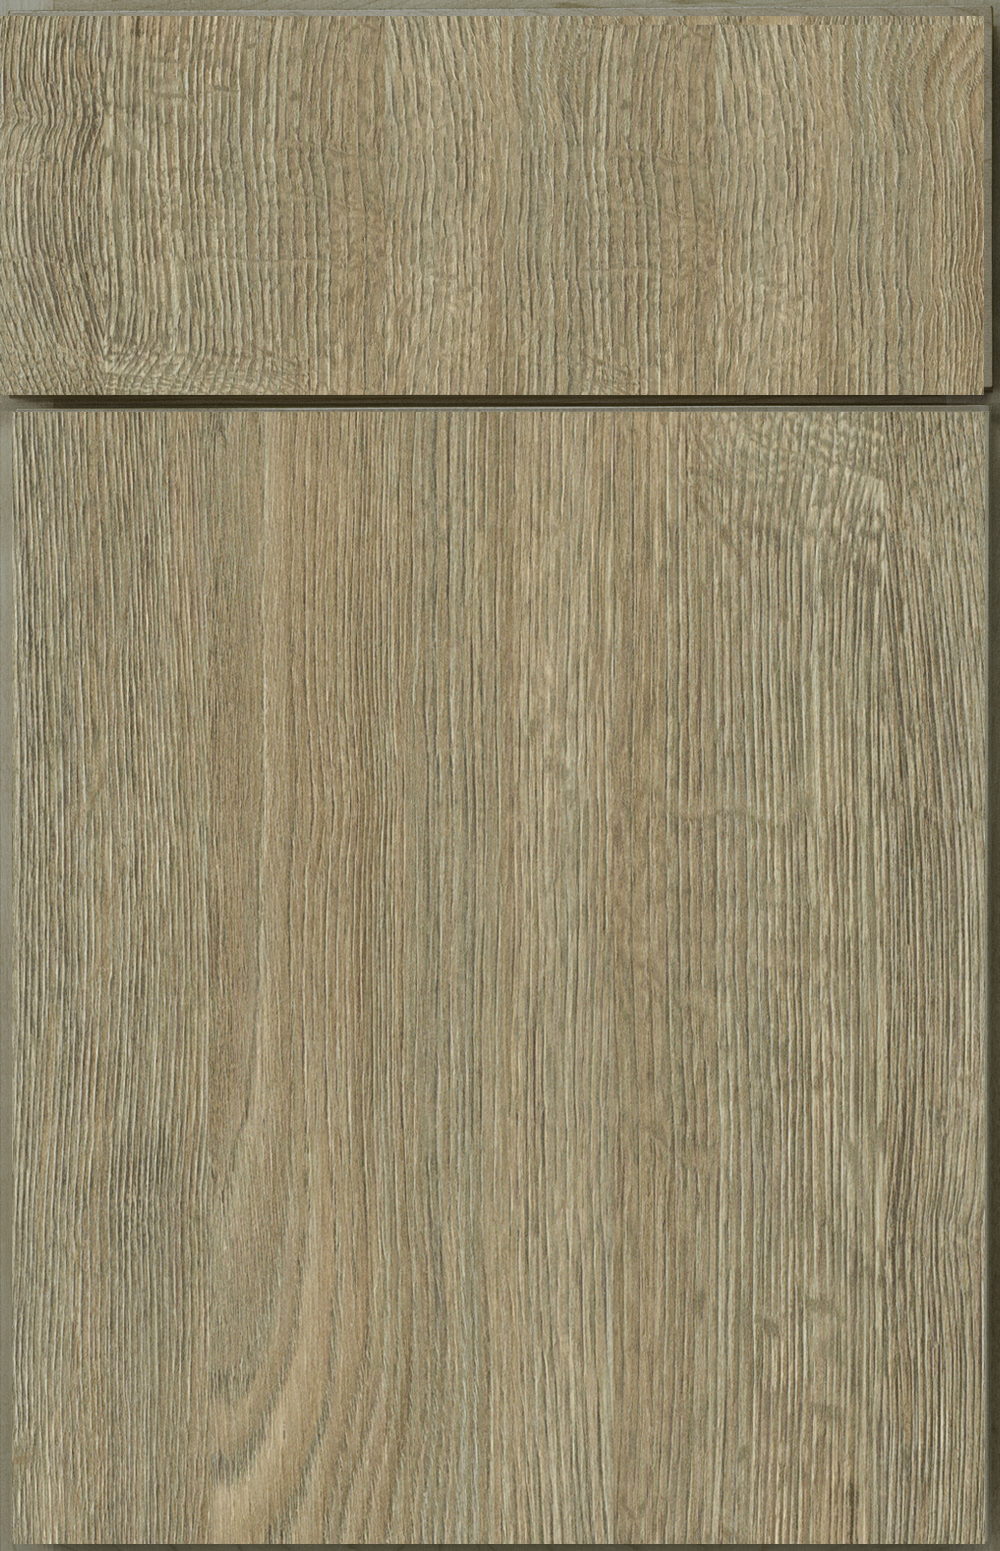 Urban II - Textured Melamine - Toasted Oak (Heavy Texture